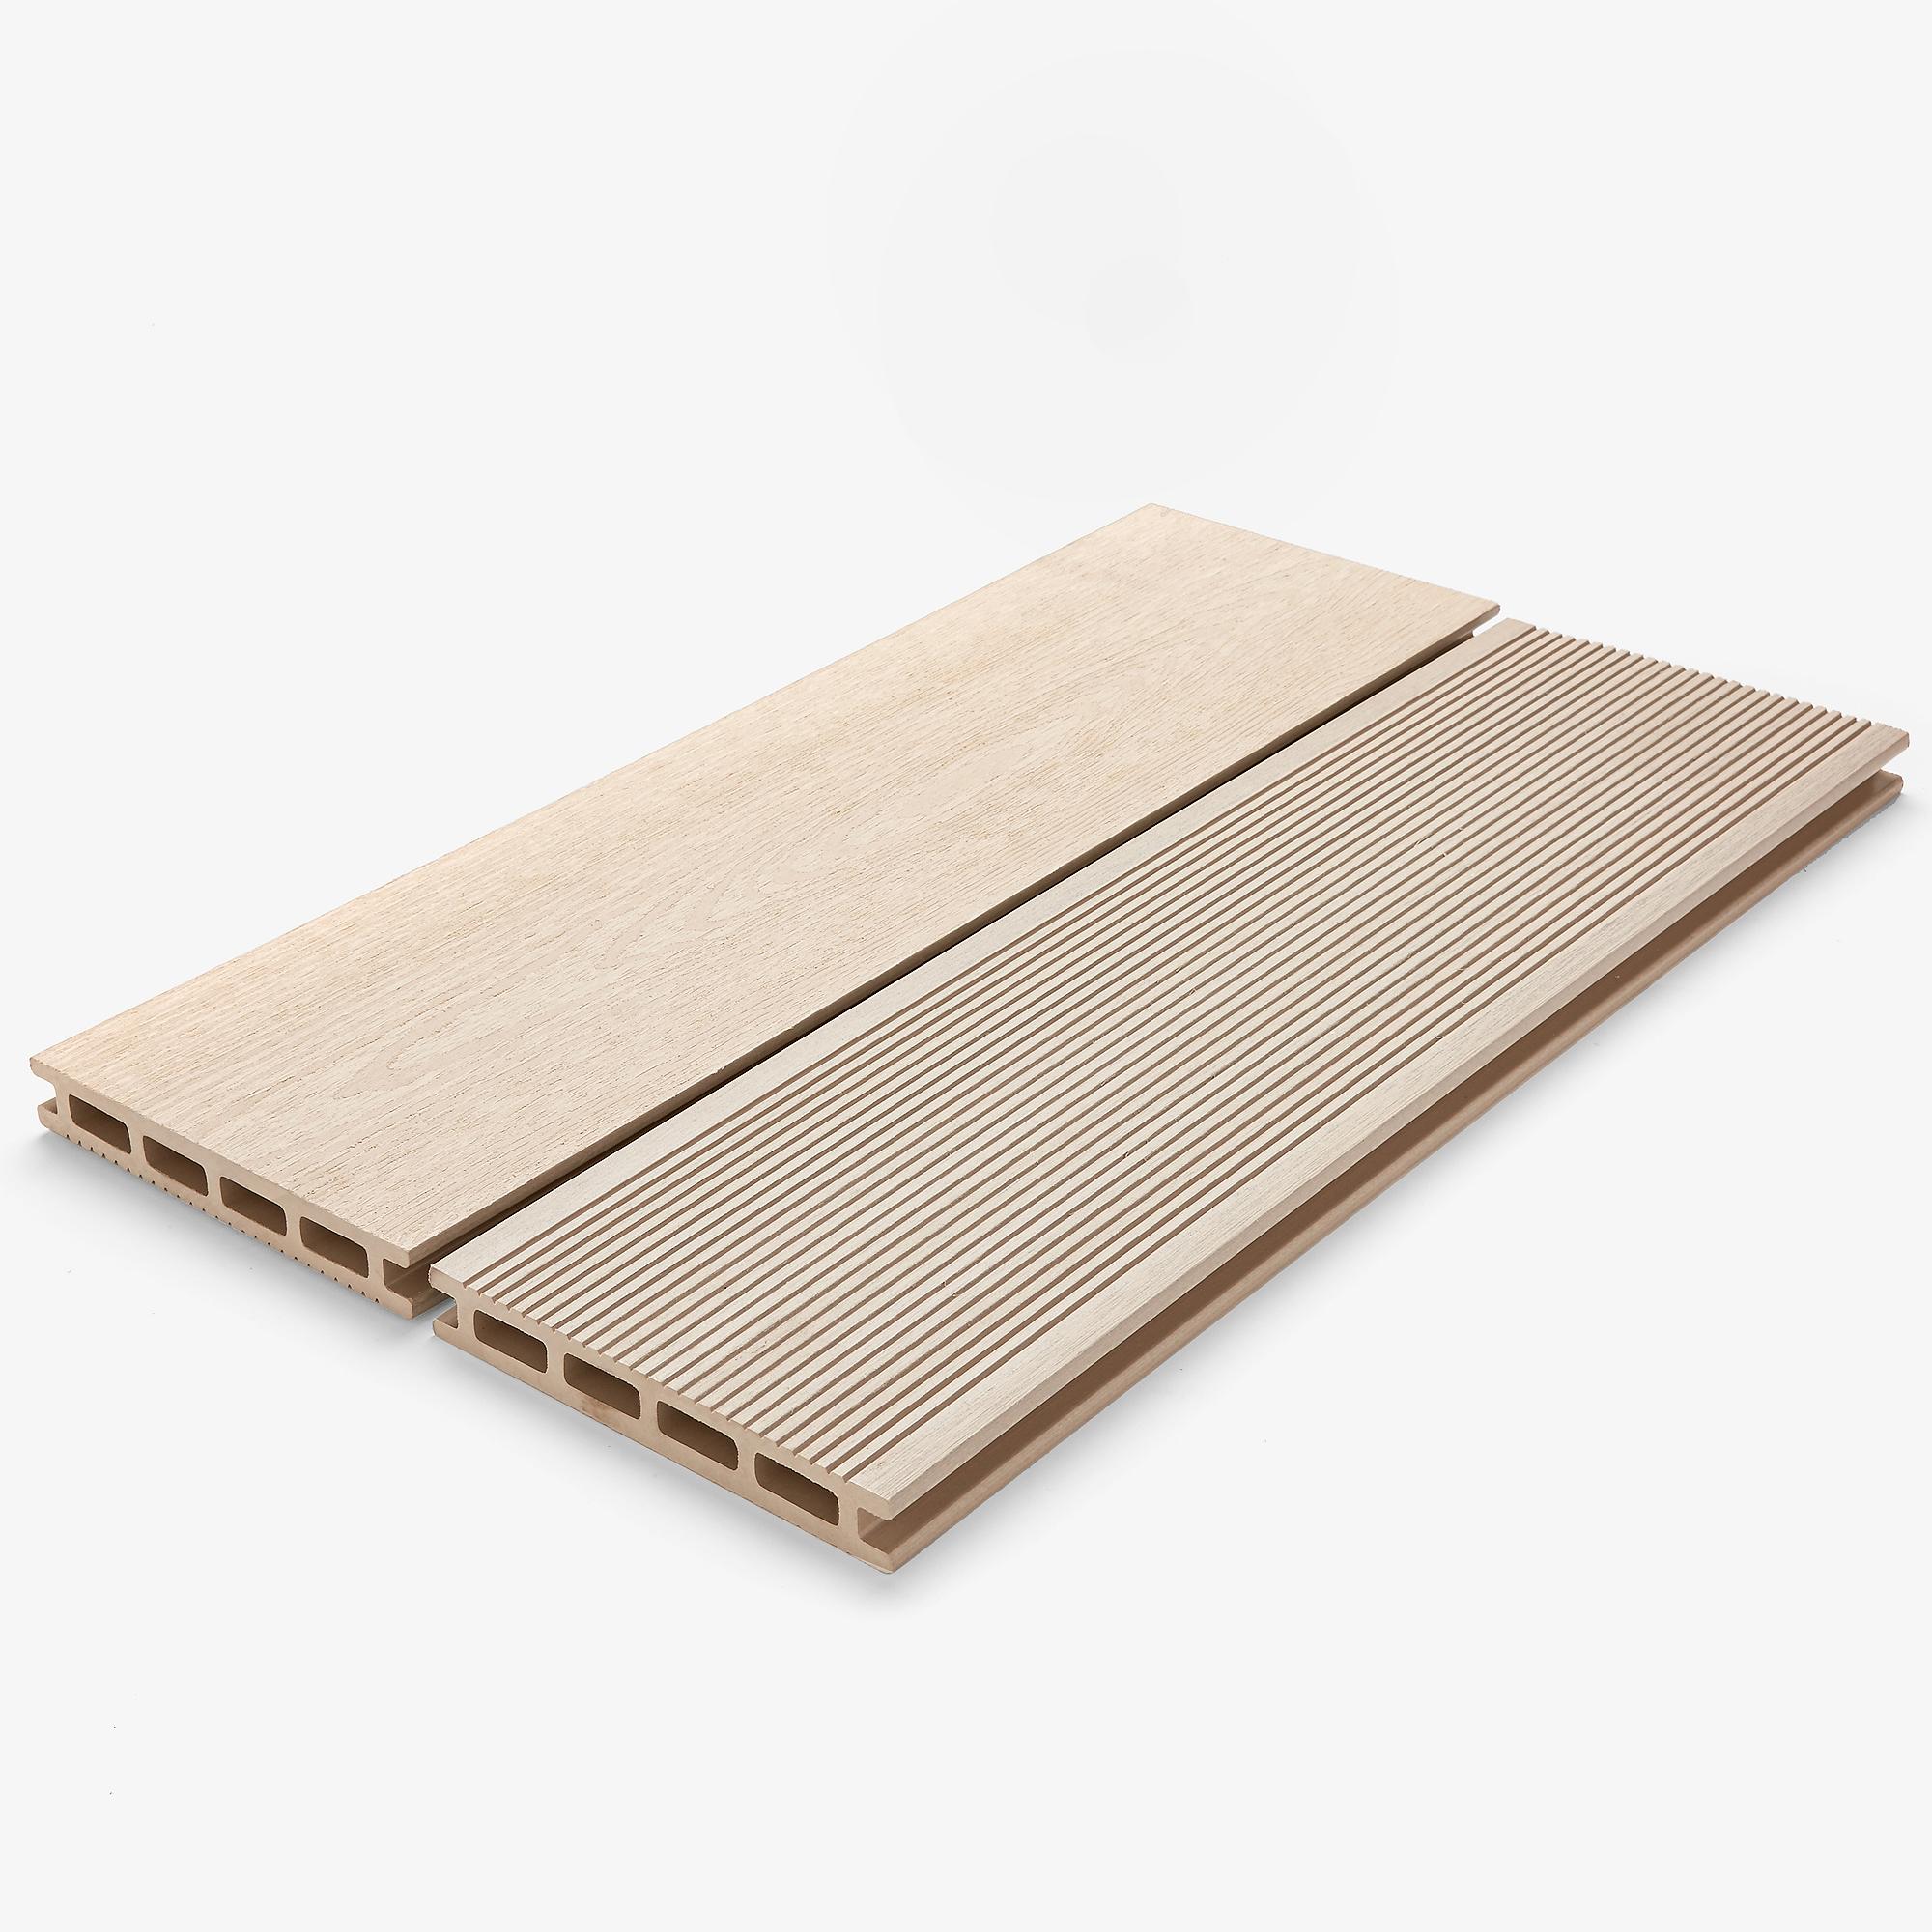 DURATRAC Decking - Pioneer - White Ash.jpg